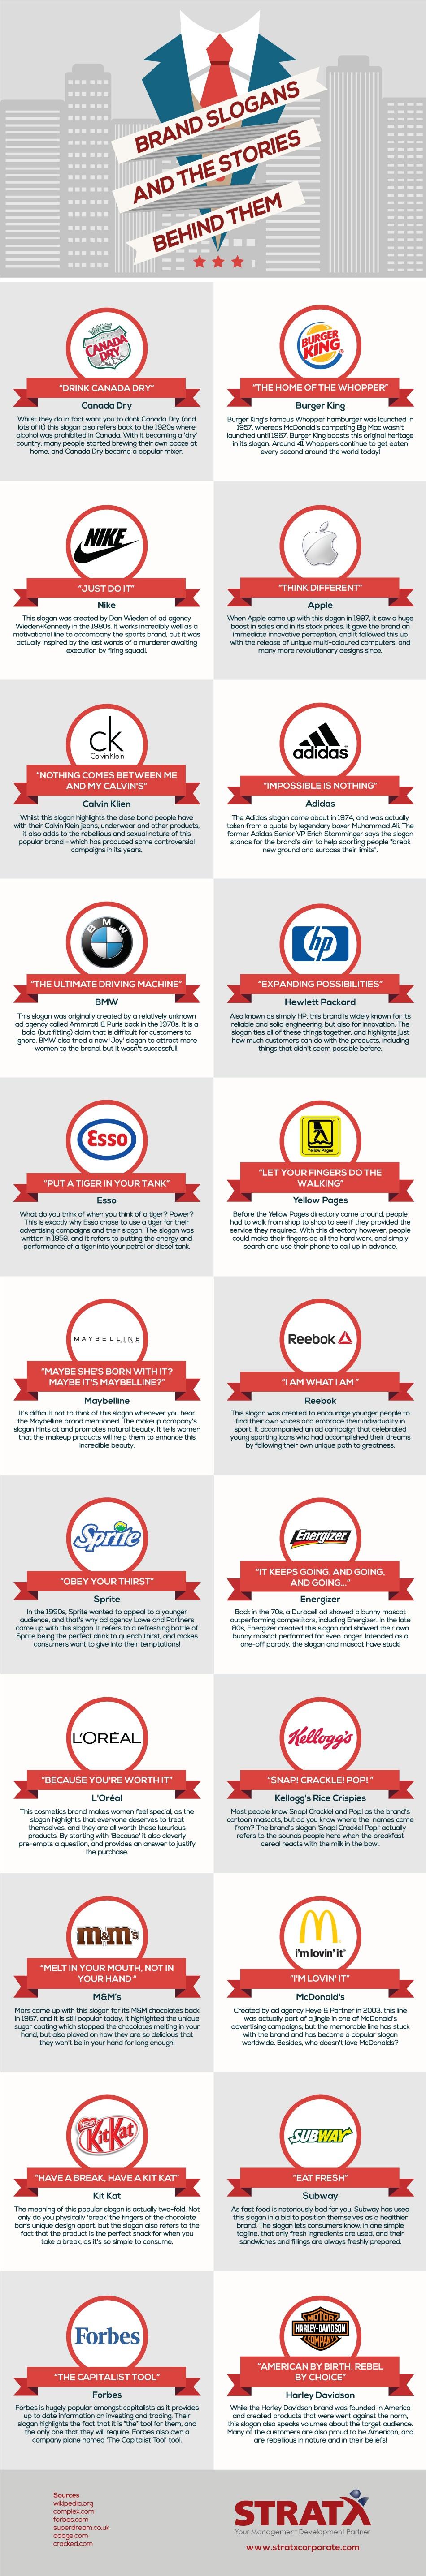 Brand Slogans Infographic